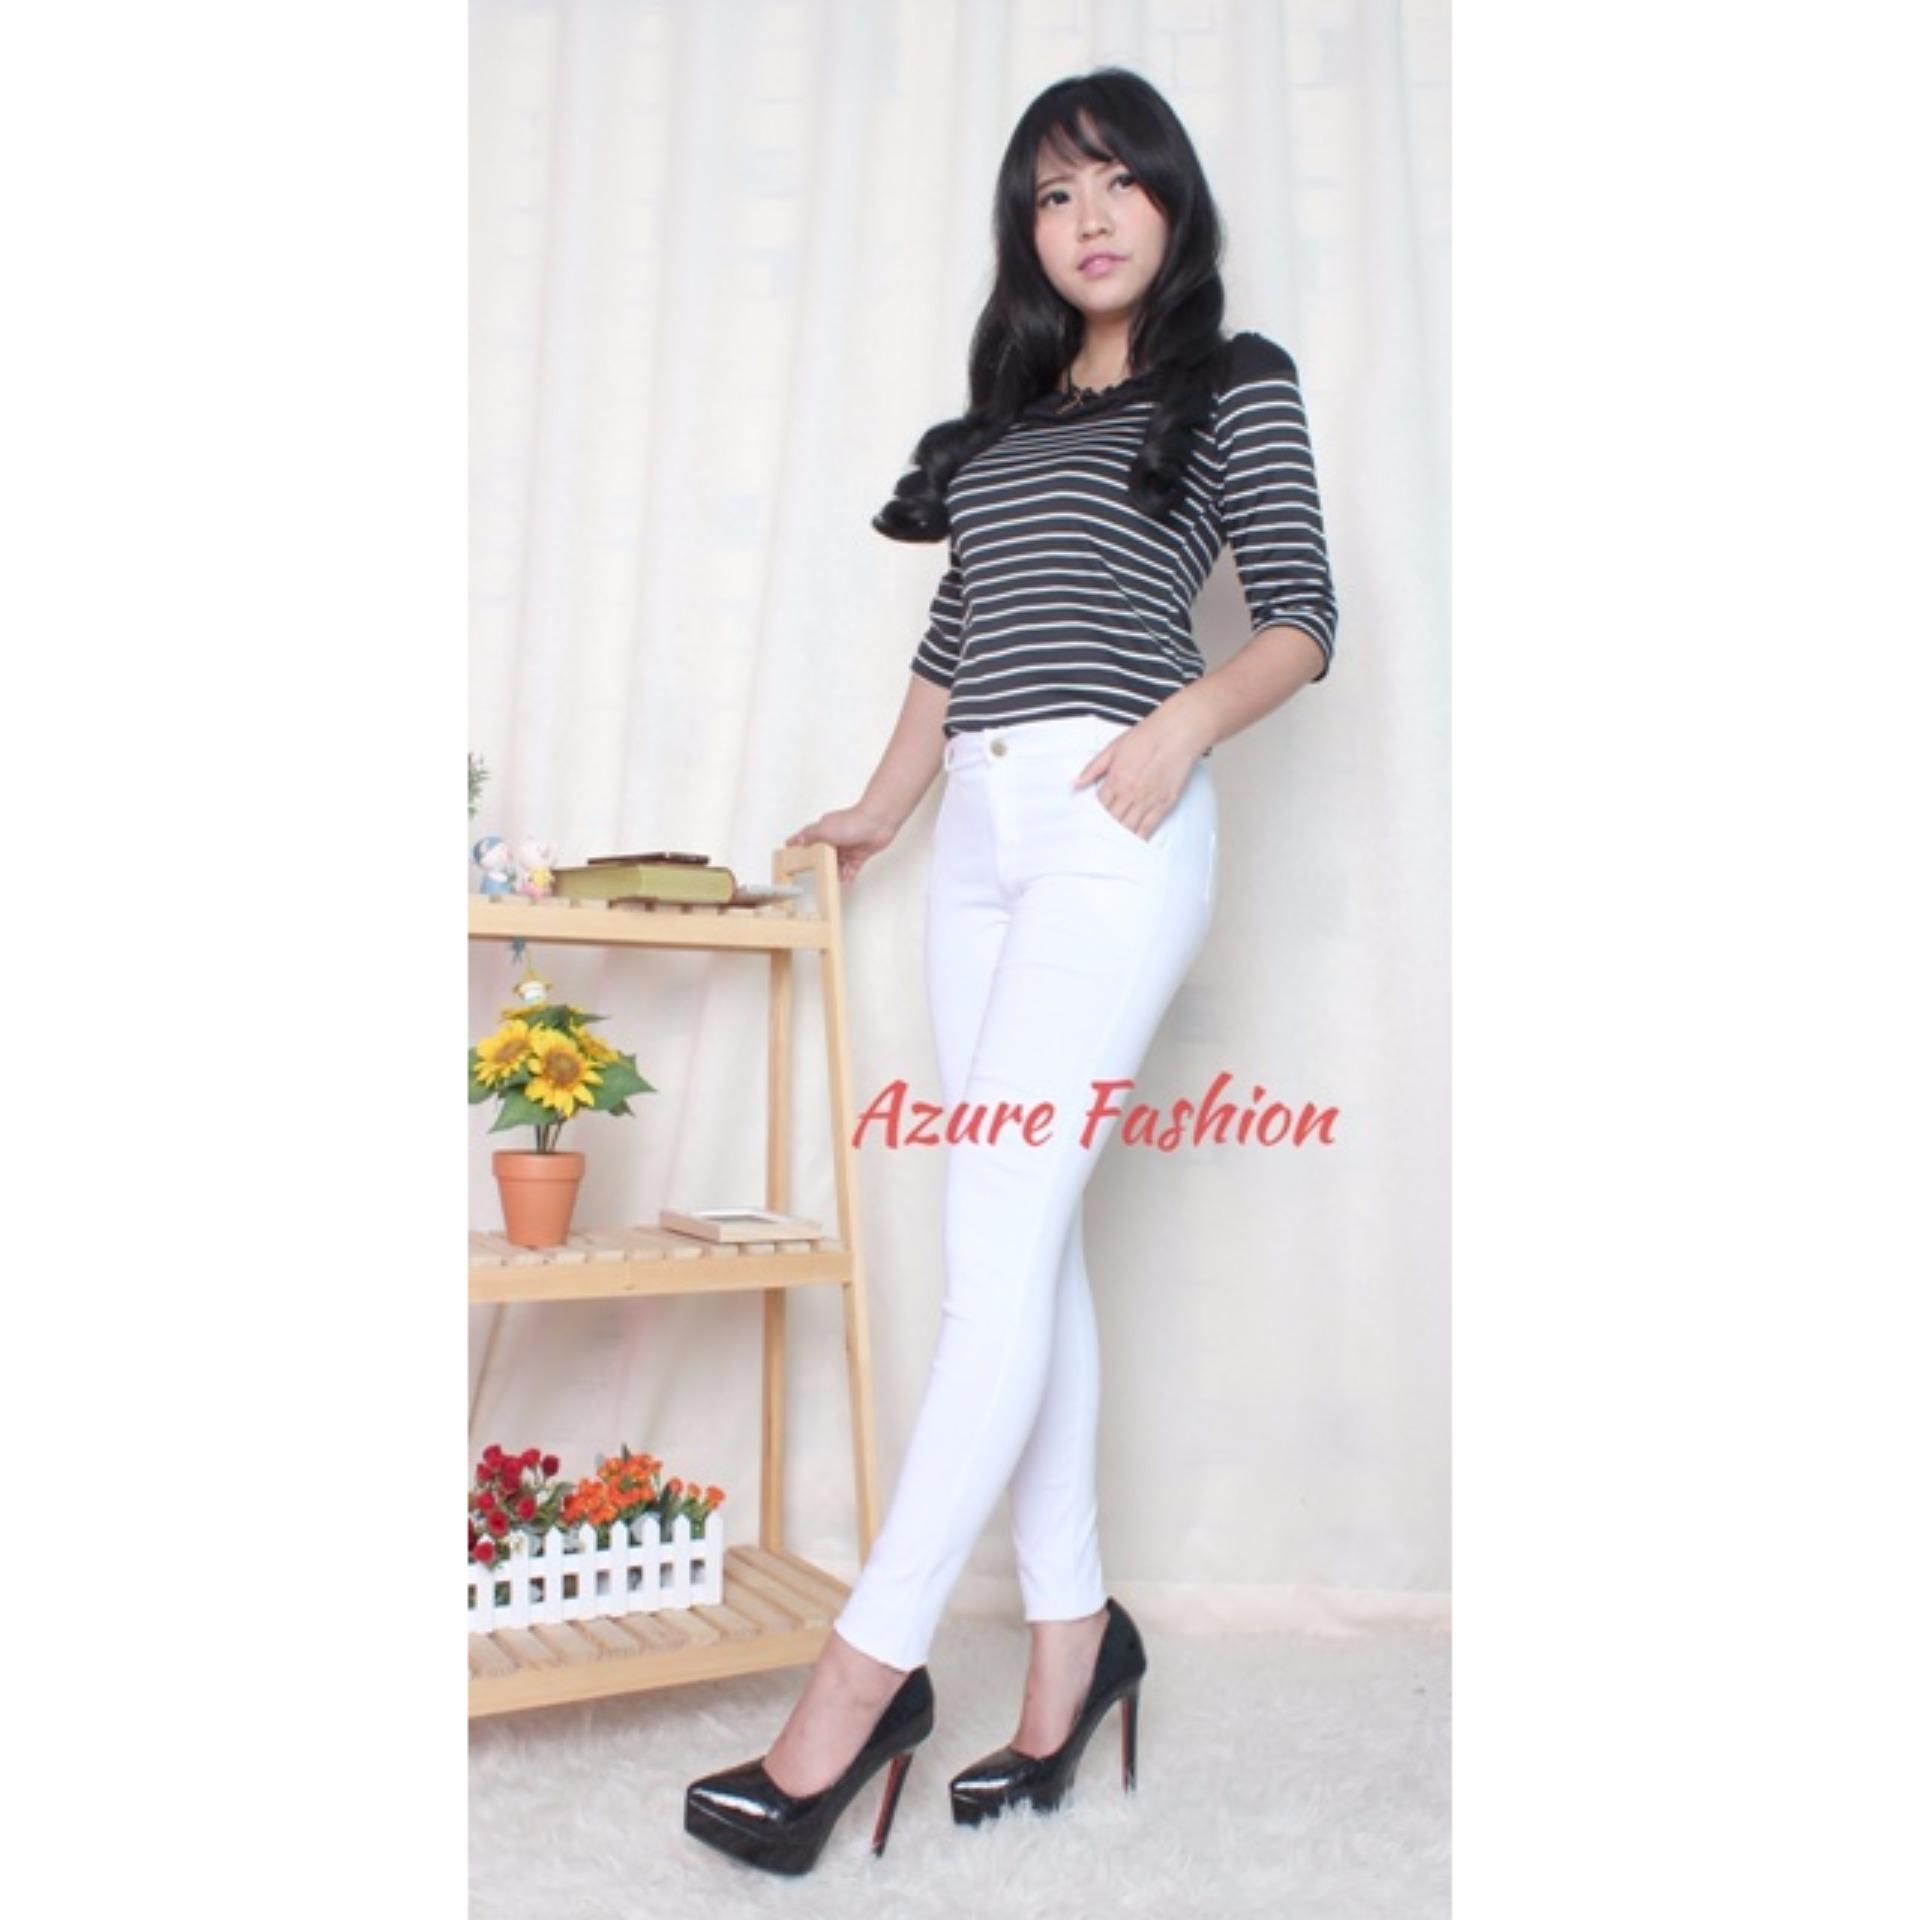 Pelacakan Harga Azure Fashion Clowy Pants Putih Bawahan Wanita Star Legging Celana Panjang